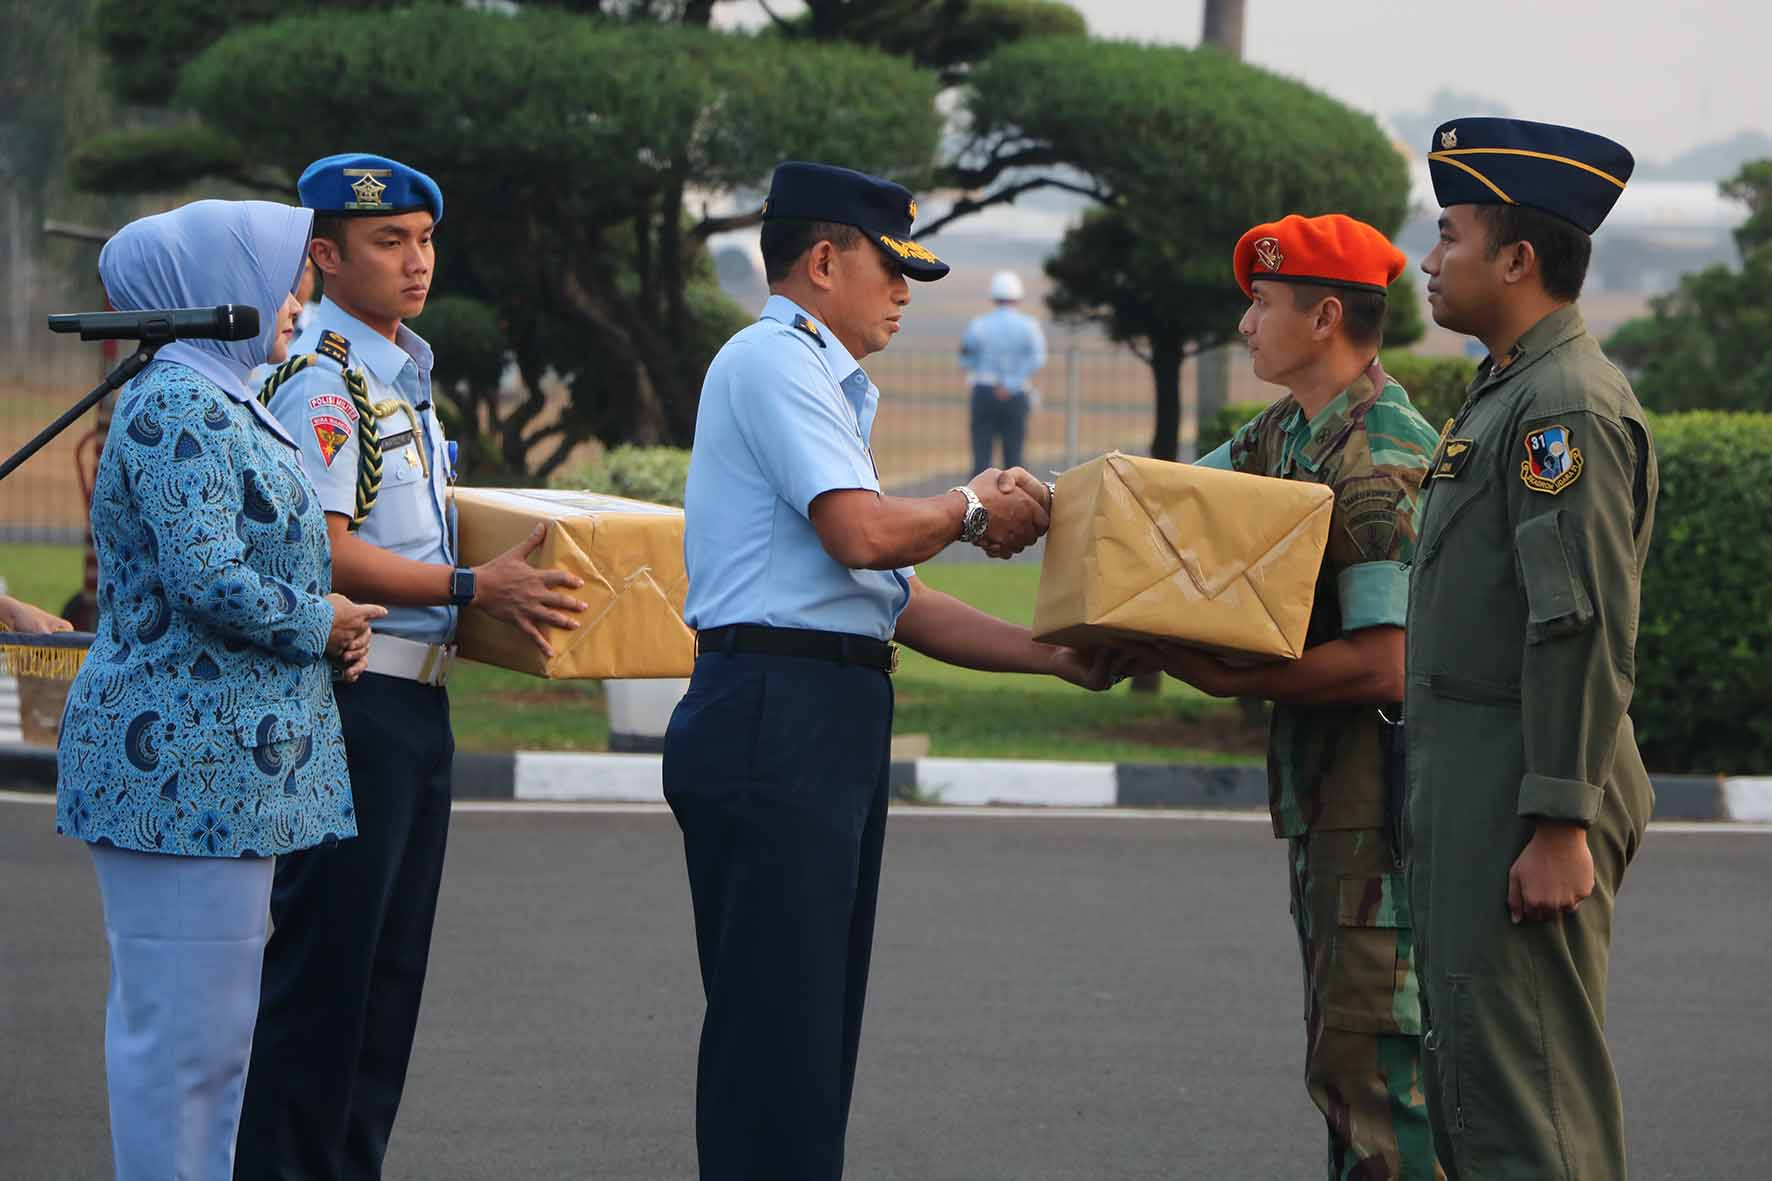 Upacara Pemberangkatan Peduli Gempa di Lombok